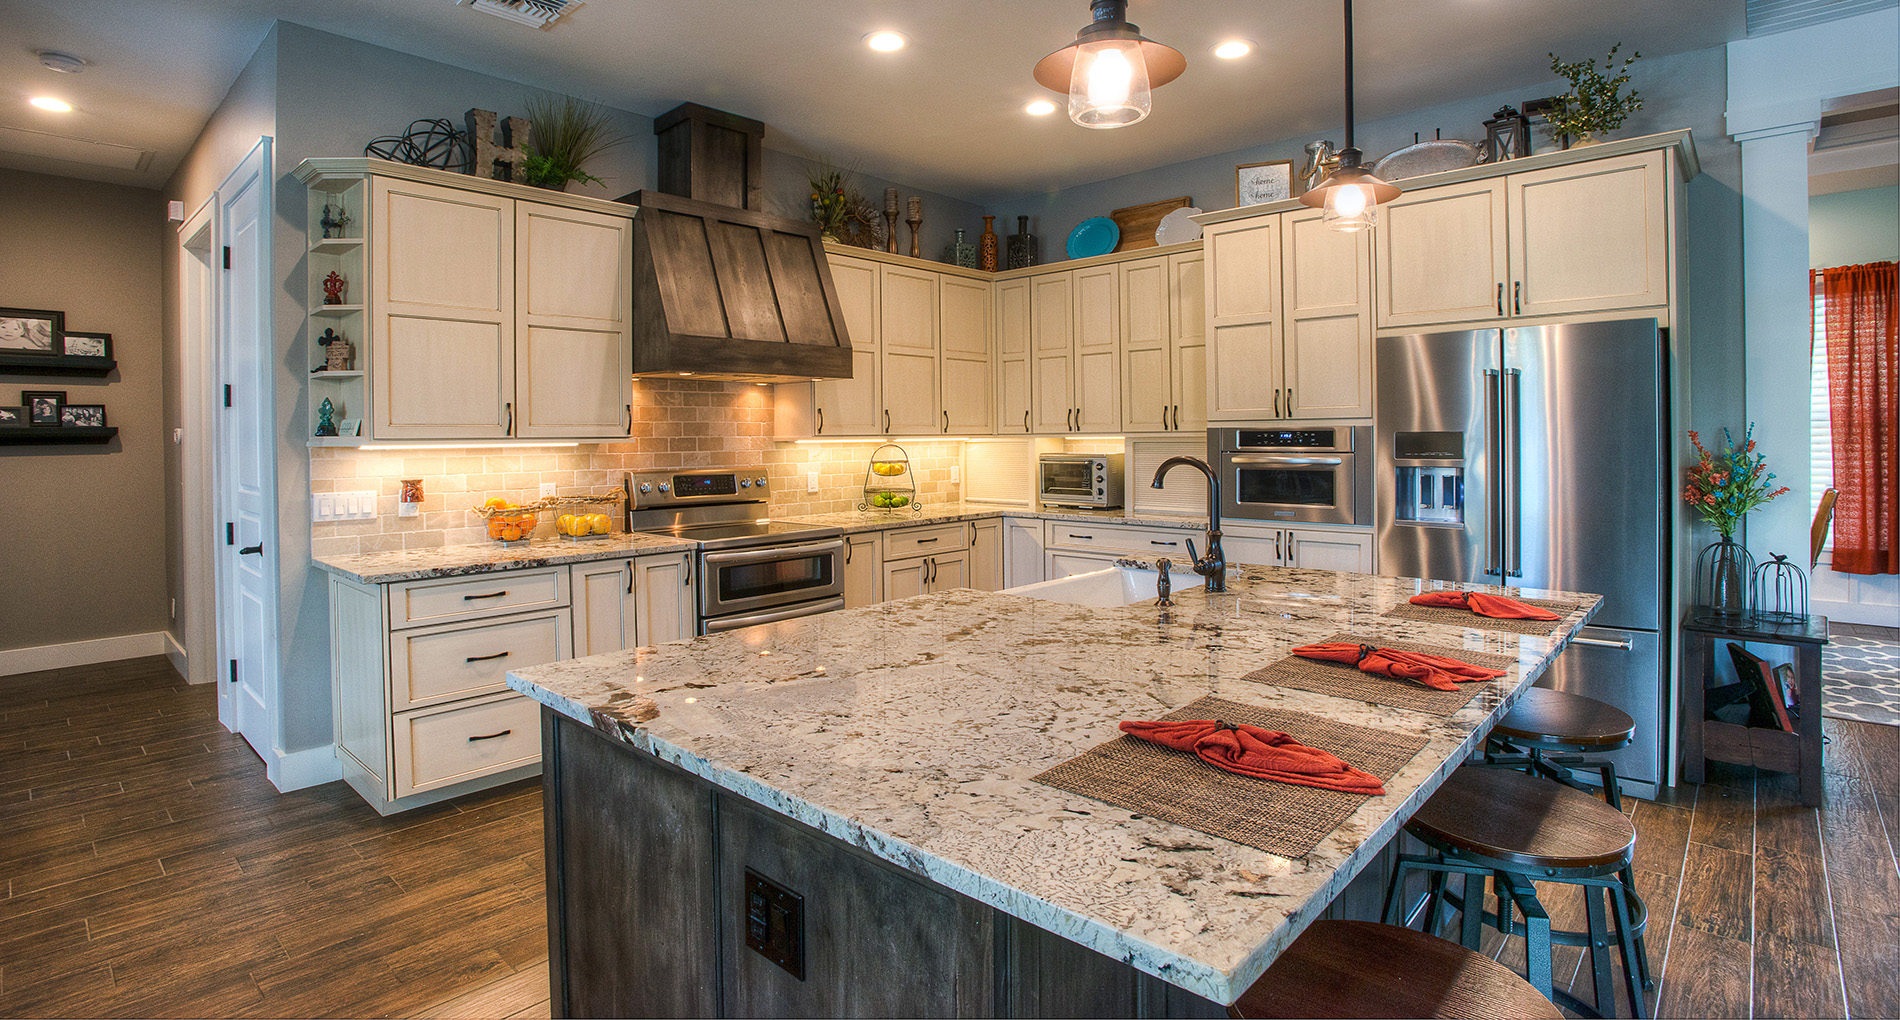 kitchen remodeling & design in sanibel | alair homes sanibel